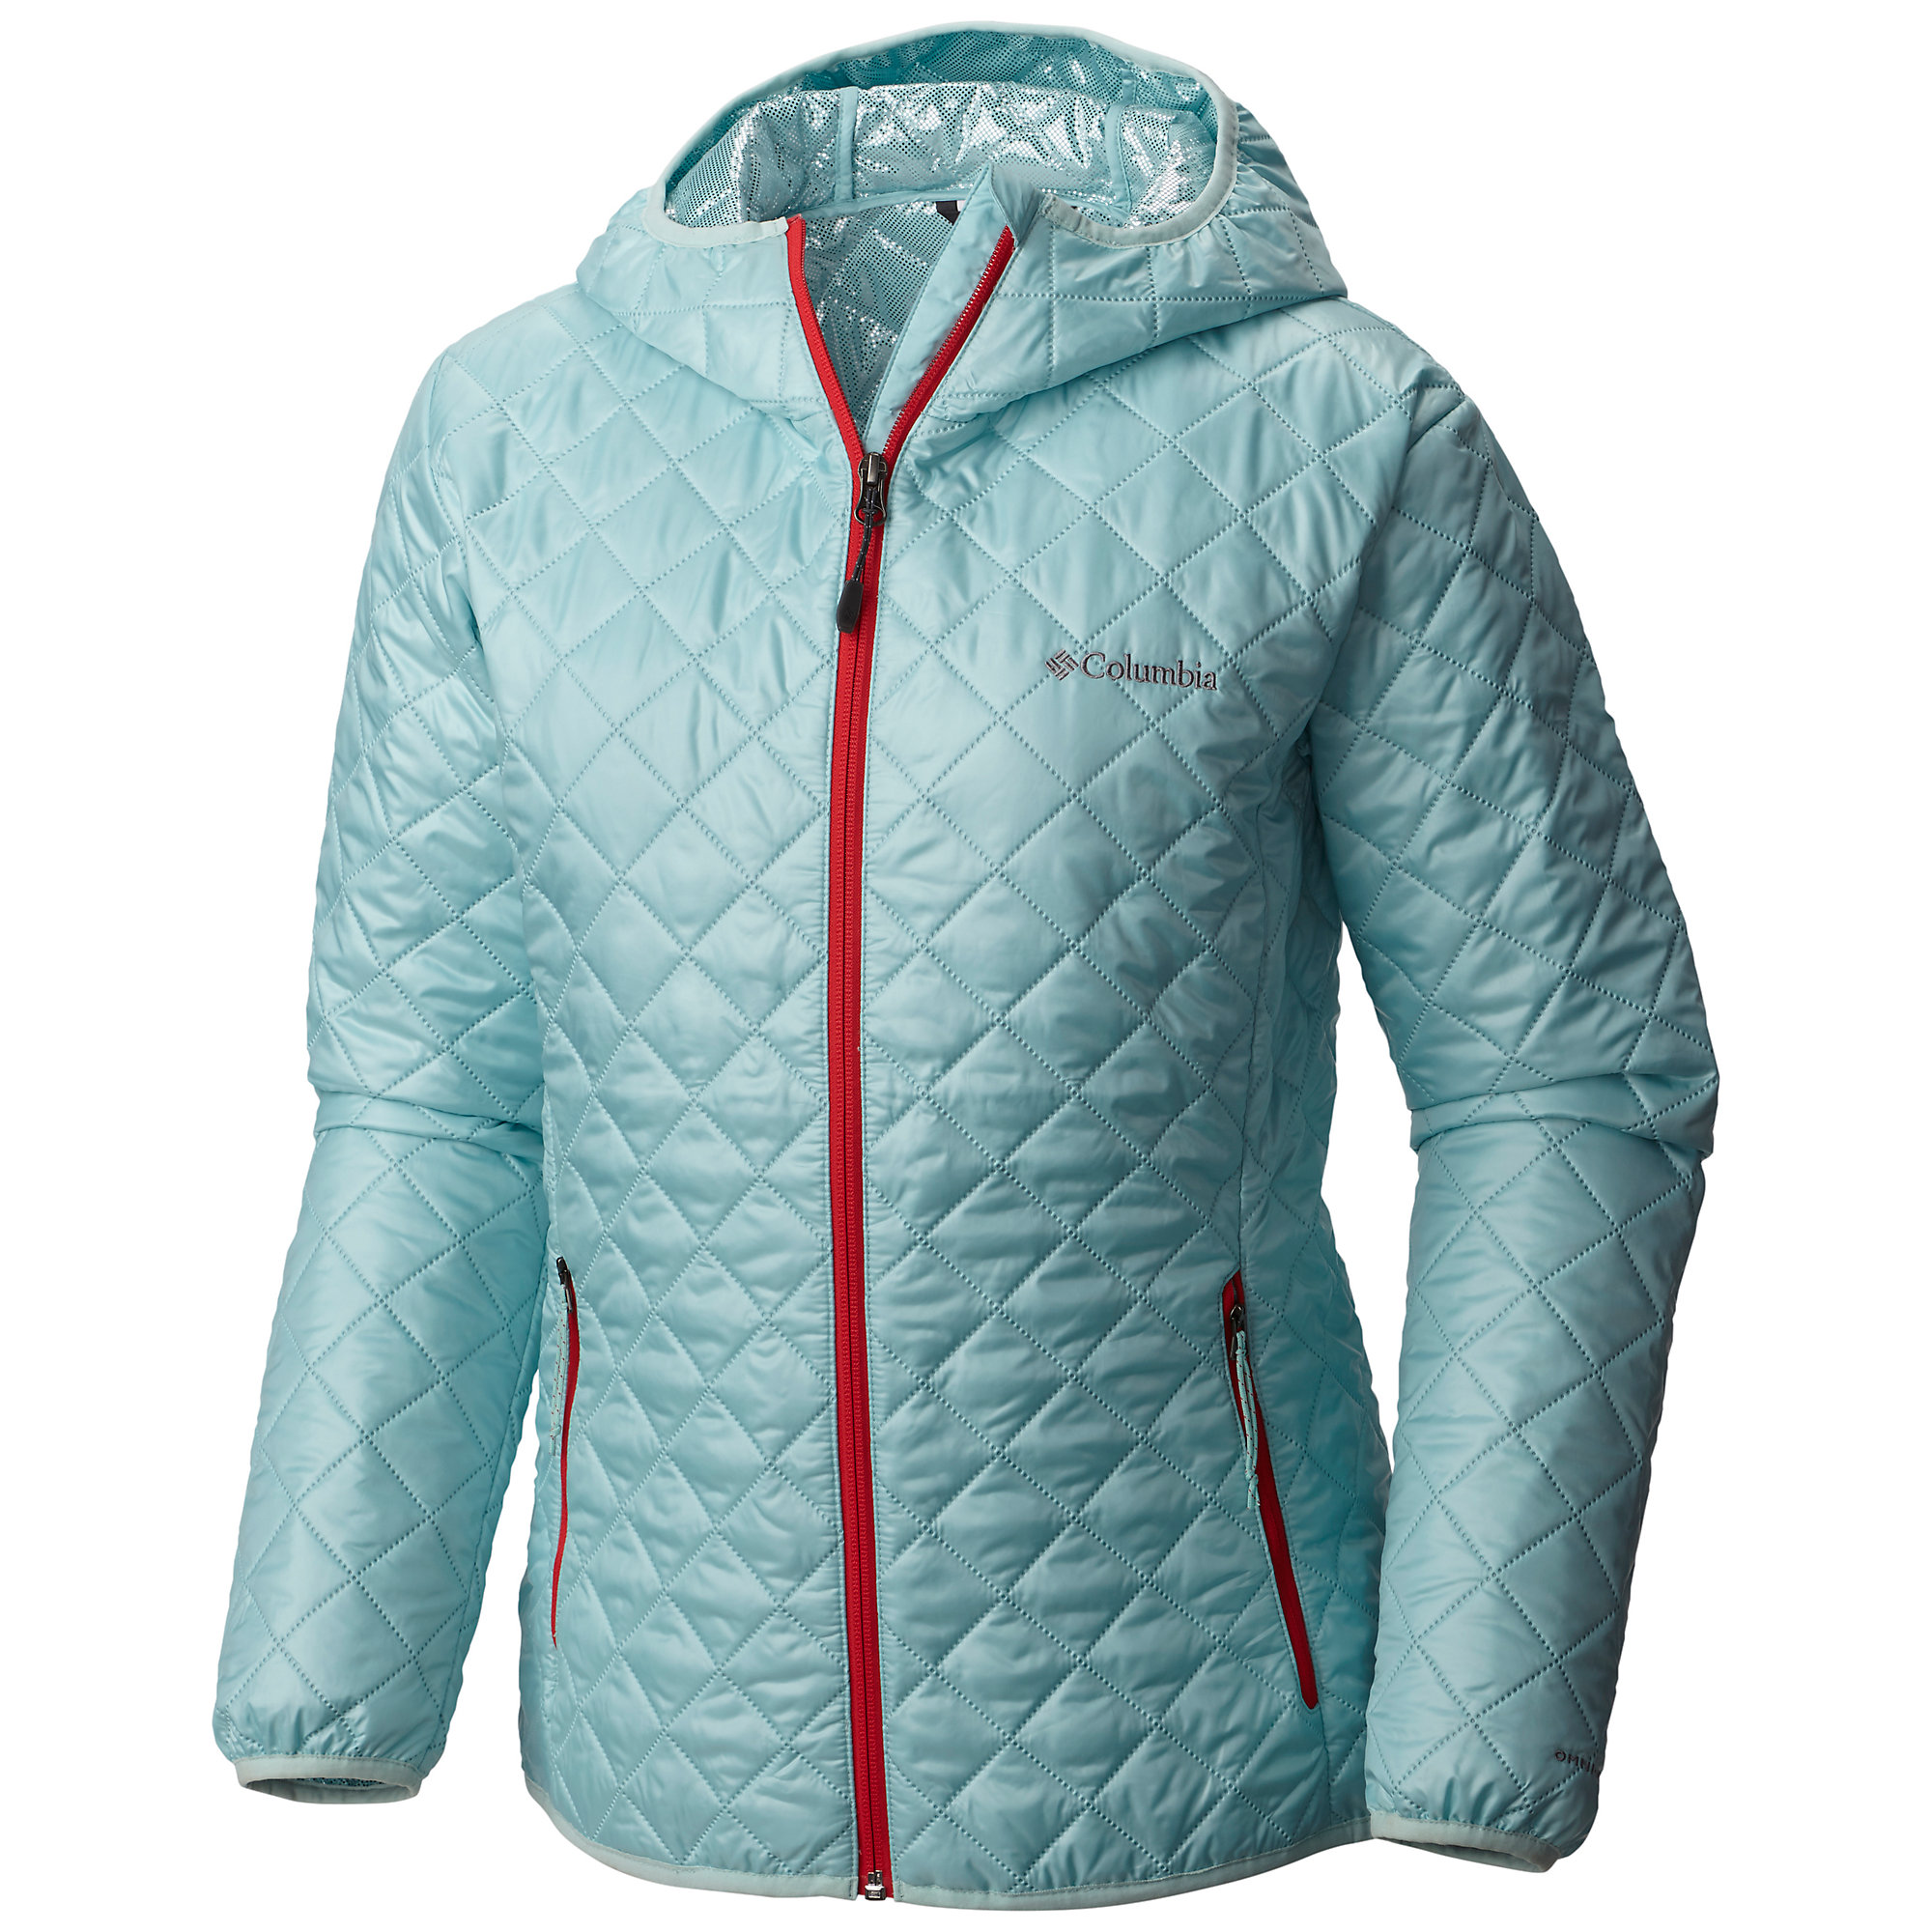 Columbia Dualistic Hooded Jacket